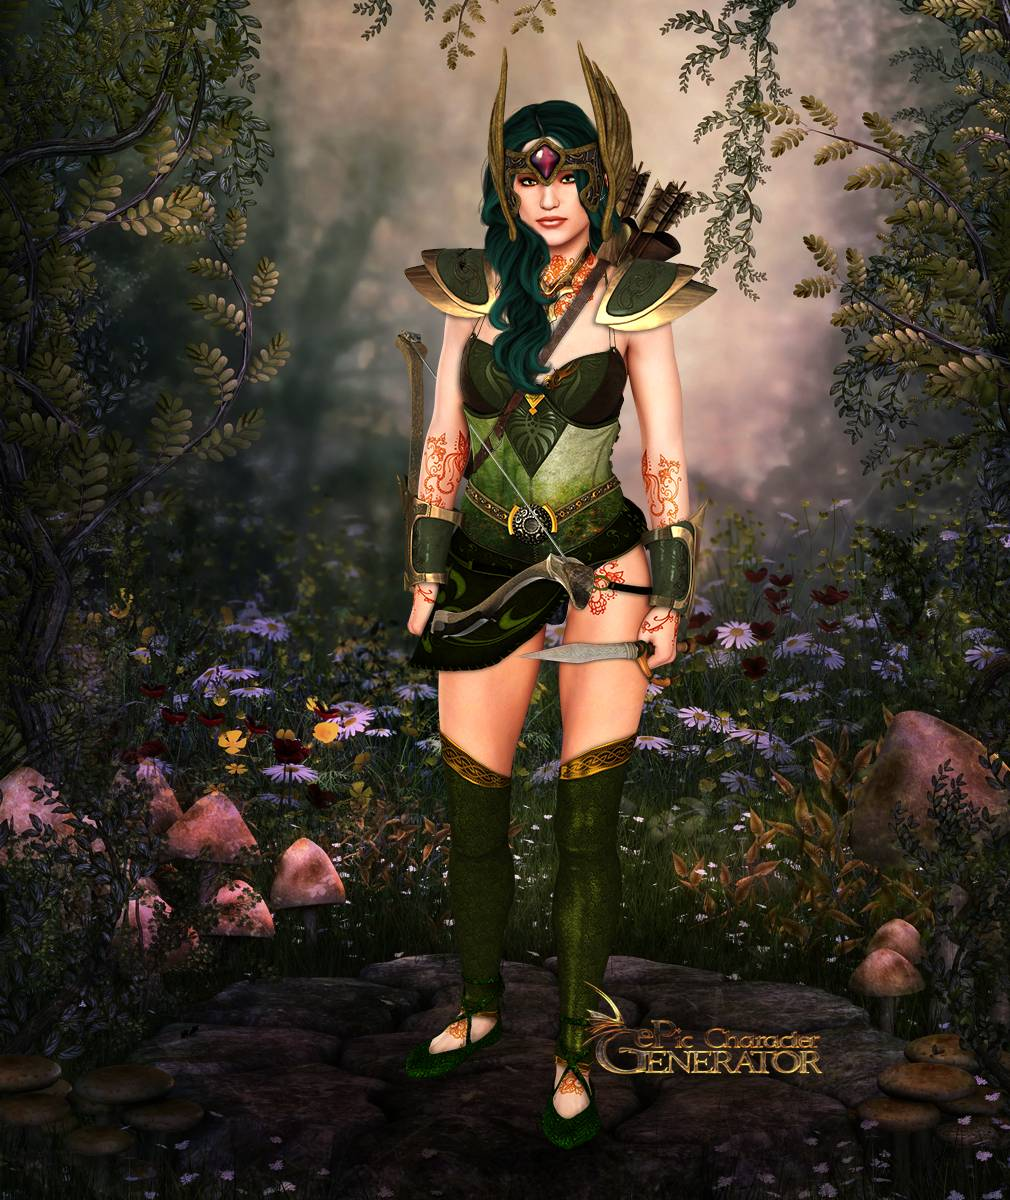 ePic Character Generator Season 2 Female Elf Screenshot 08